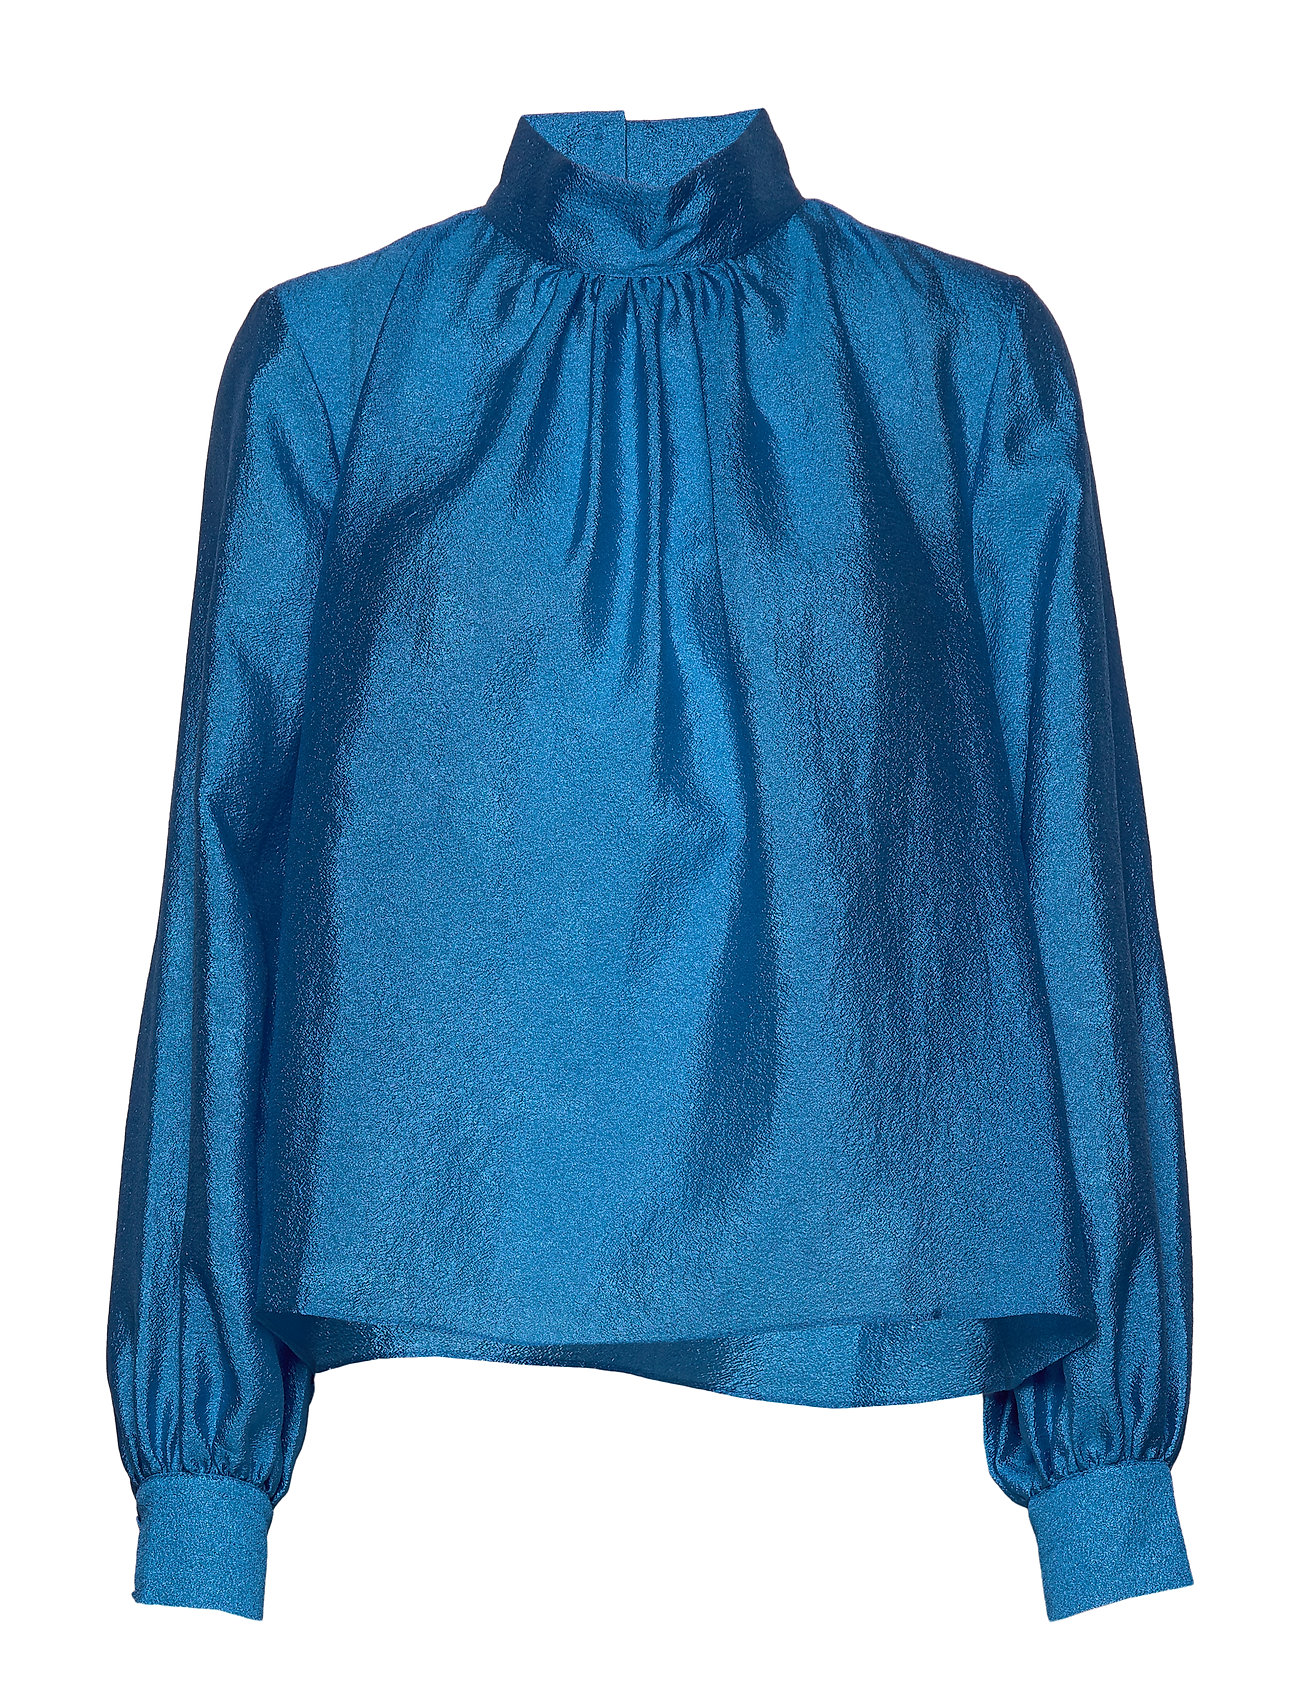 STINE GOYA Eddy, 784 Textured Poly - BLUE